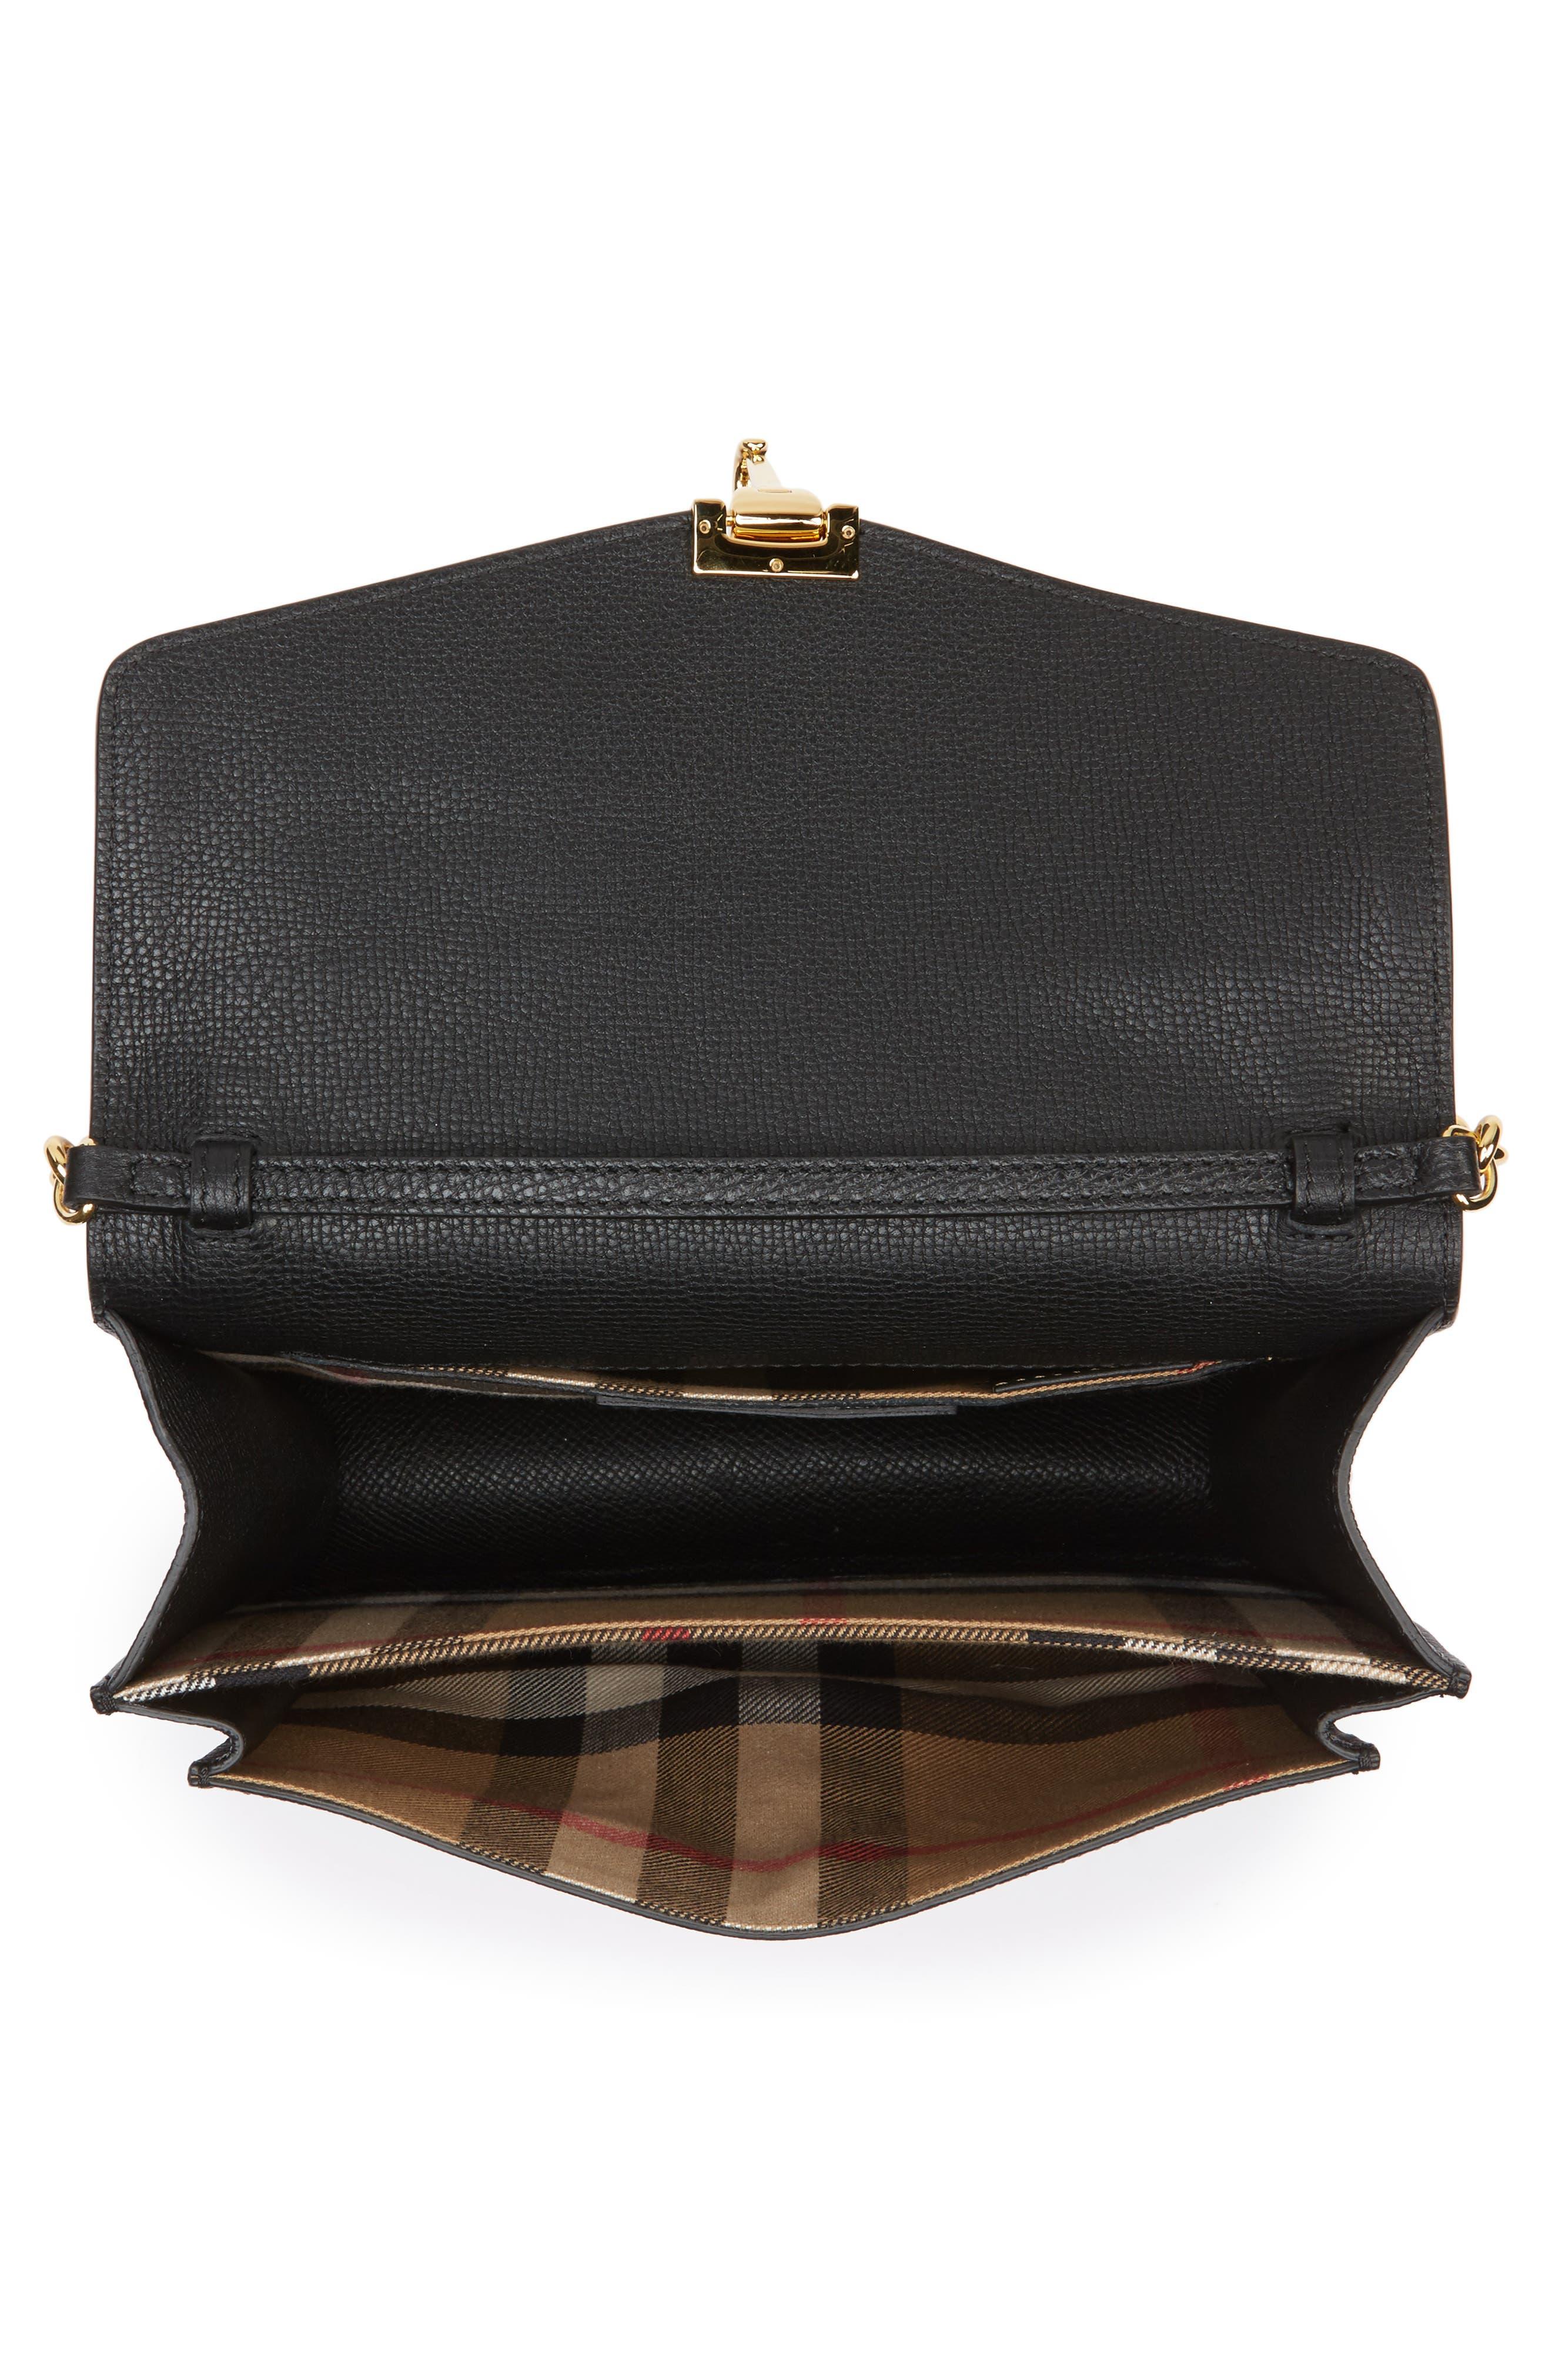 Macken Leather Crossbody Bag,                             Alternate thumbnail 4, color,                             001